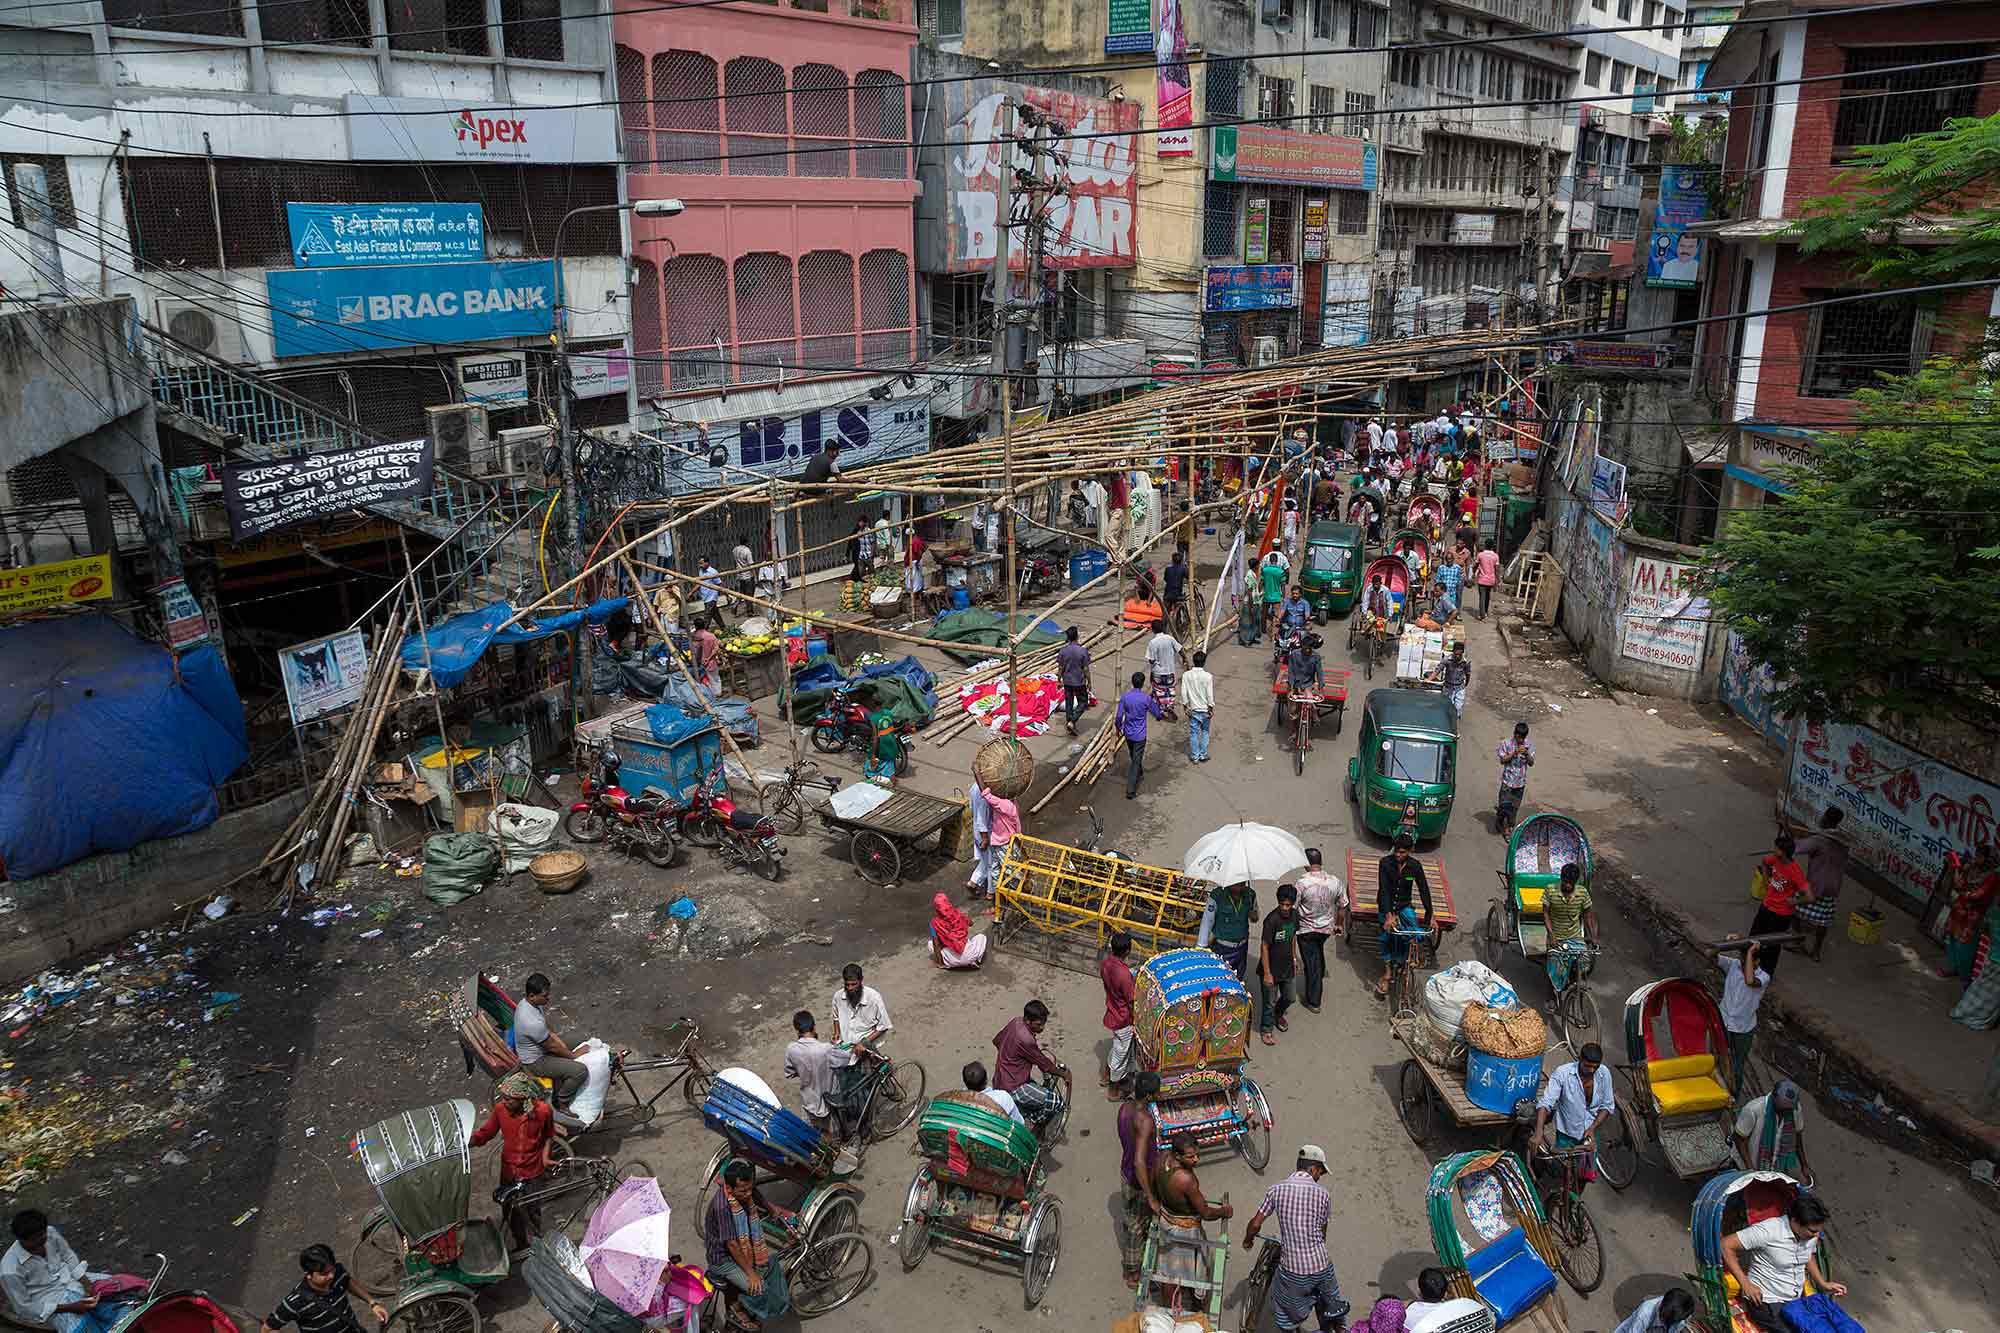 Busy Dhaka, Bangladesh. © Ulli Maier & Nisa Maier